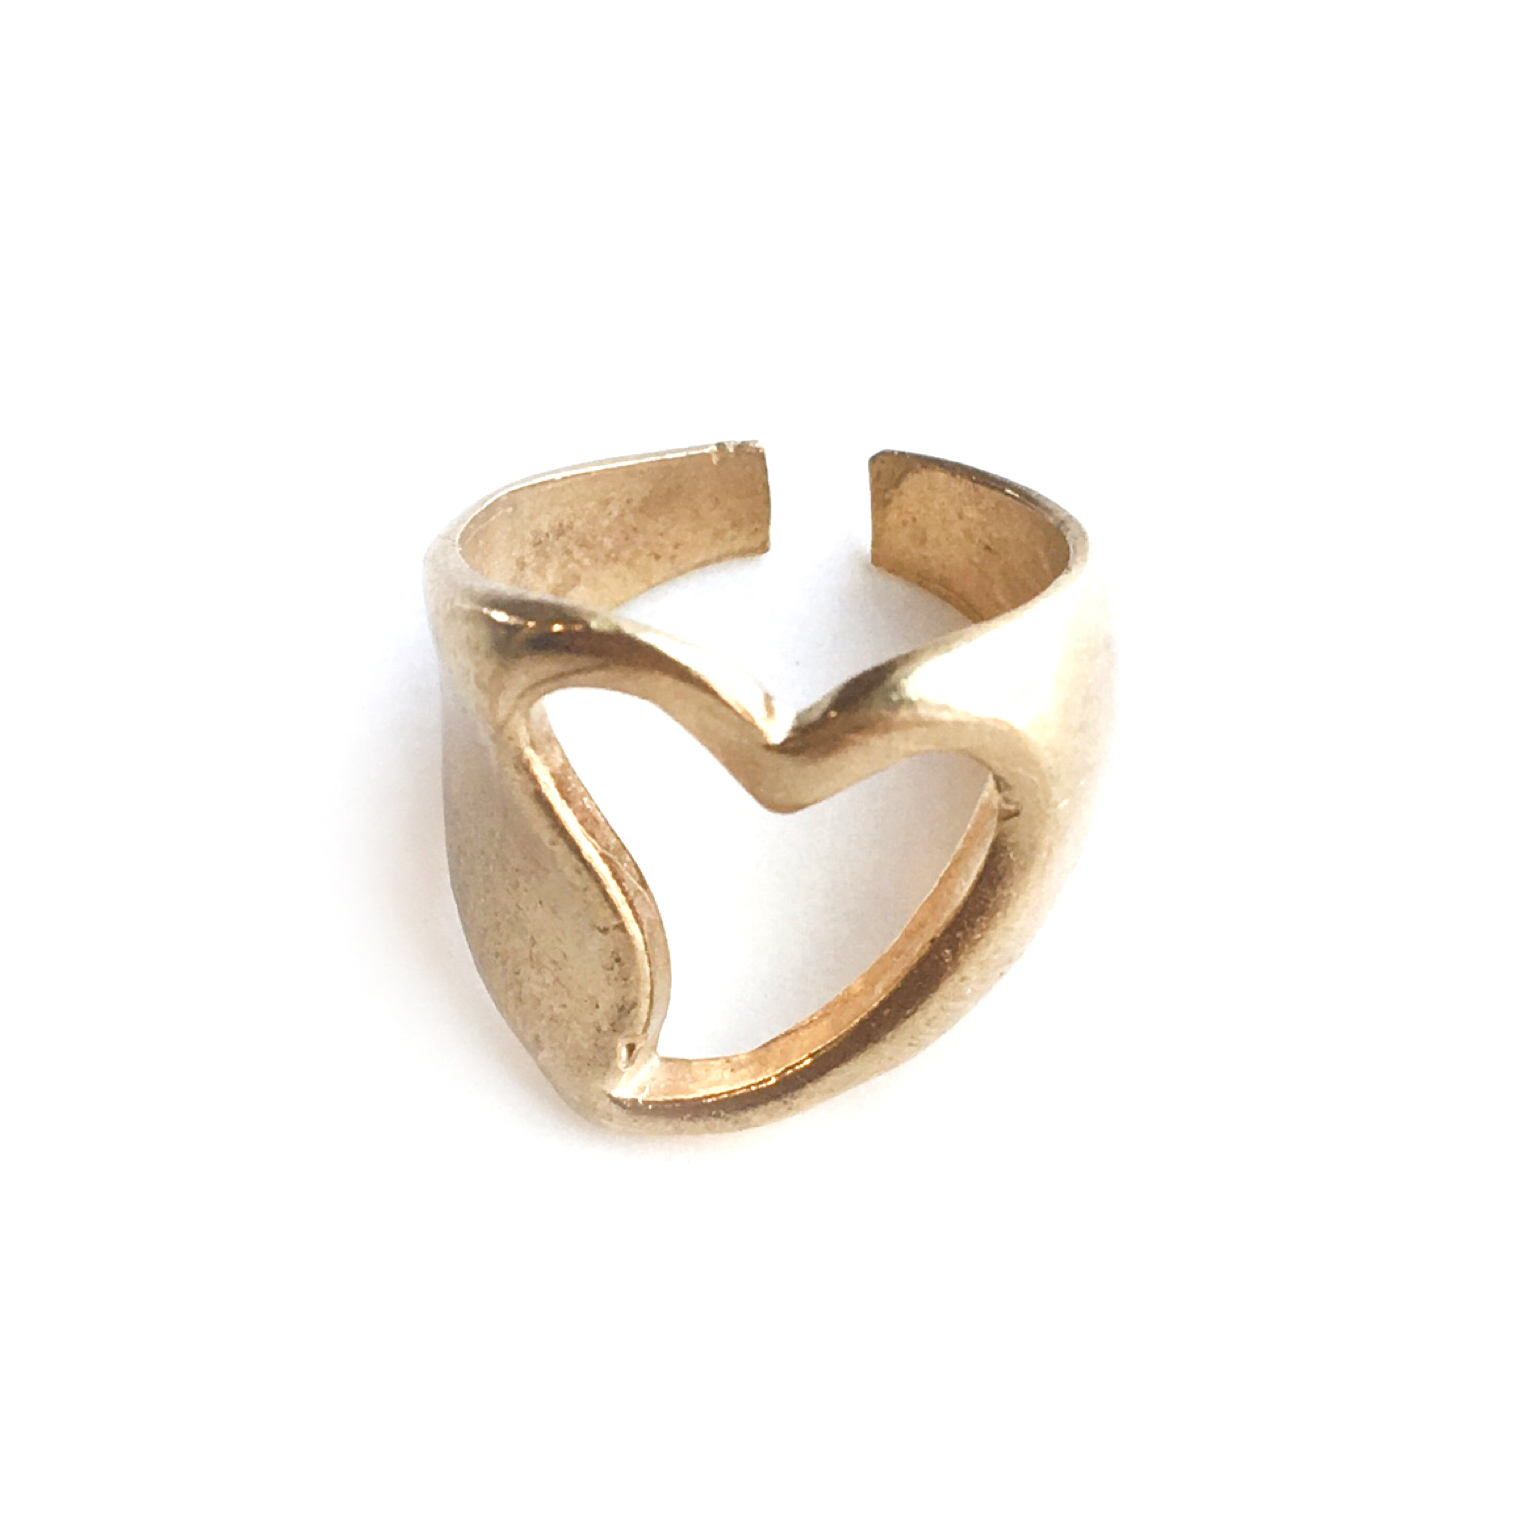 Raw brass Rings - ハートリング N0.11